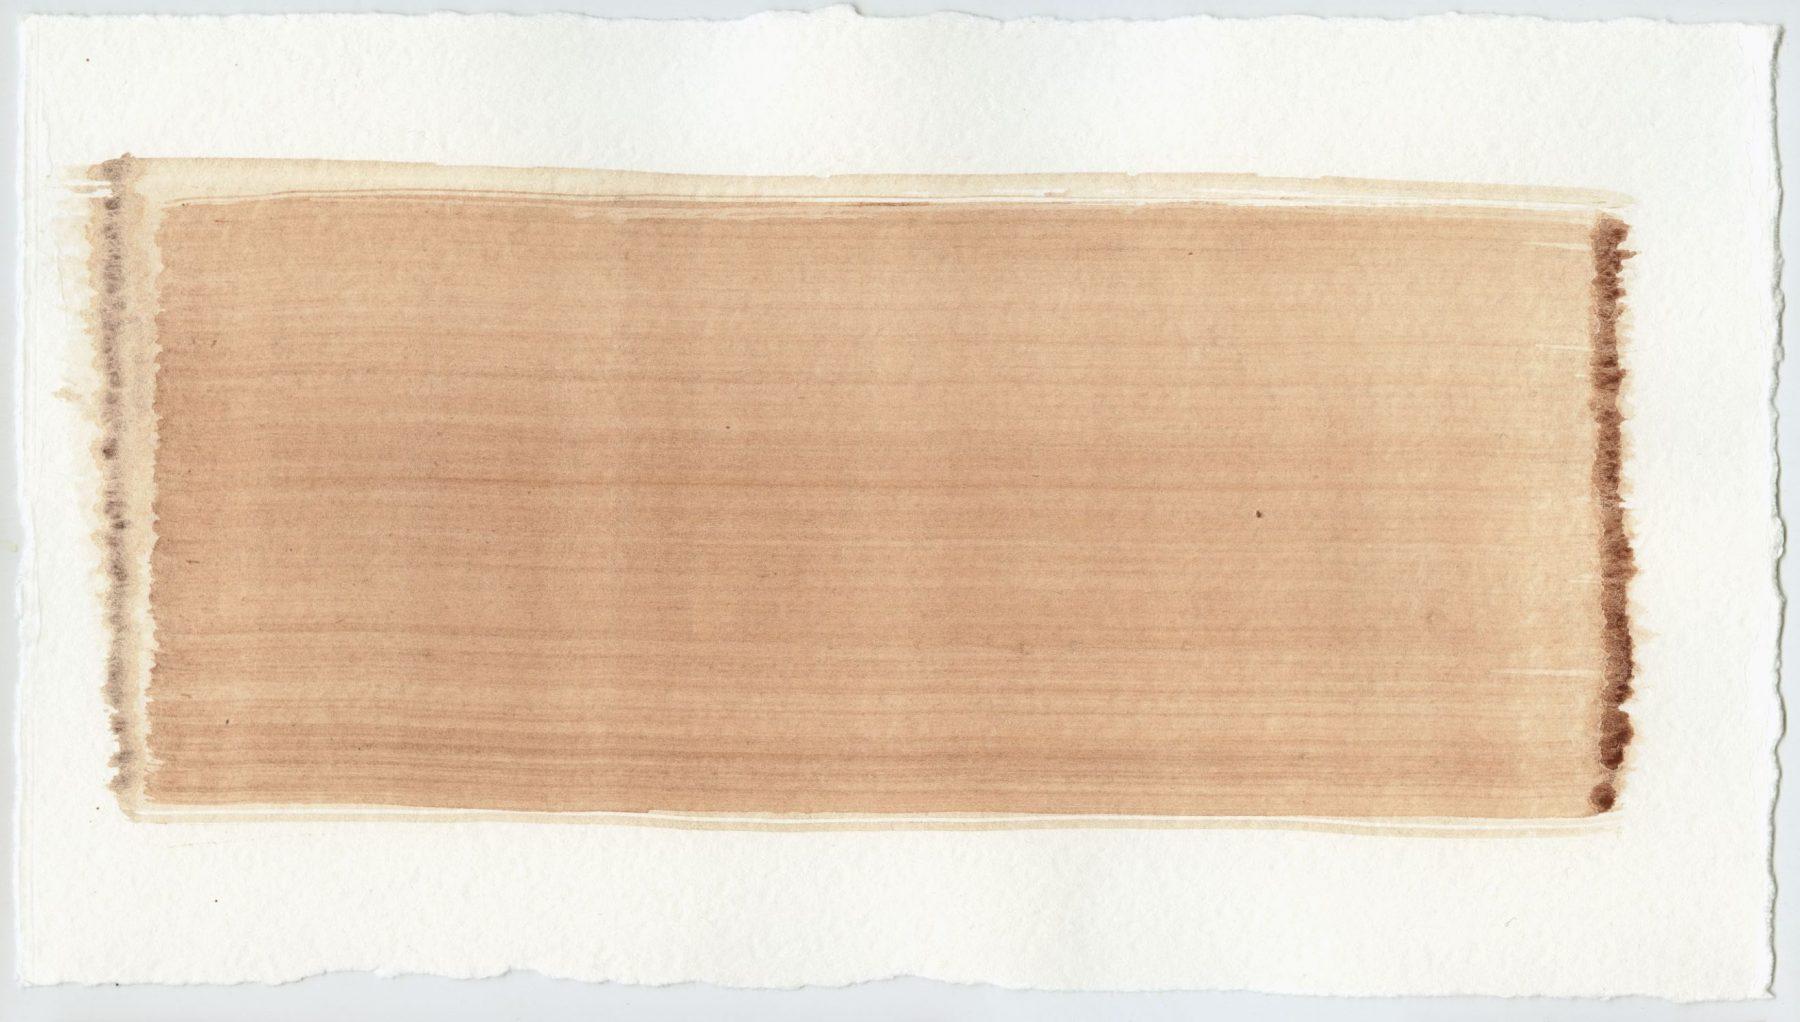 Brush stroke no. 113 - Selfmade pigment: Mortelse oker gebrand, IJzeroer gebrand